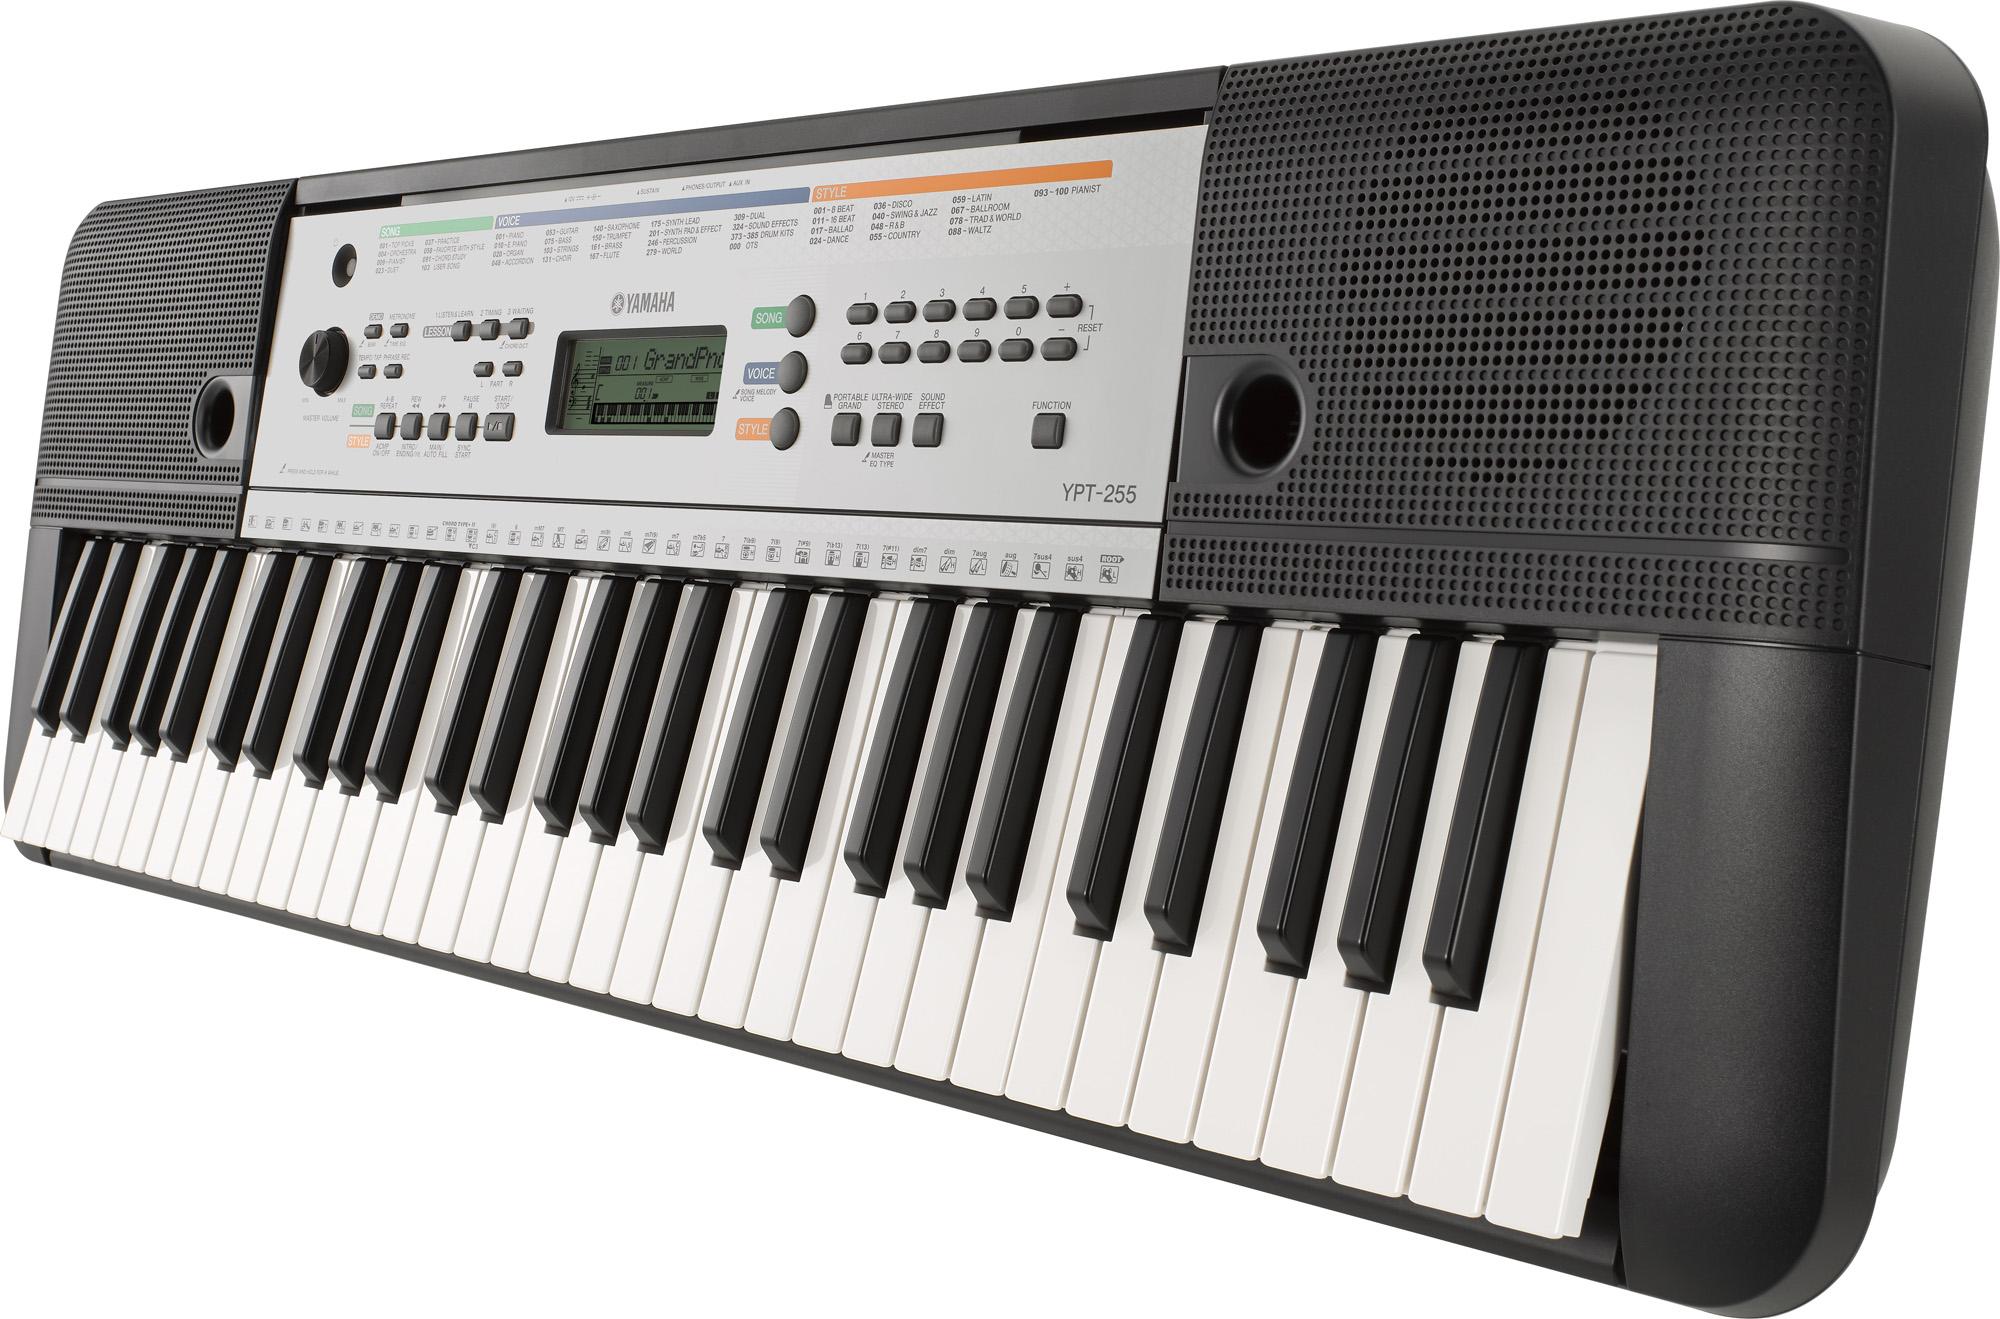 yamaha ypt 255 portable home keyboard 61 note keyboard. Black Bedroom Furniture Sets. Home Design Ideas